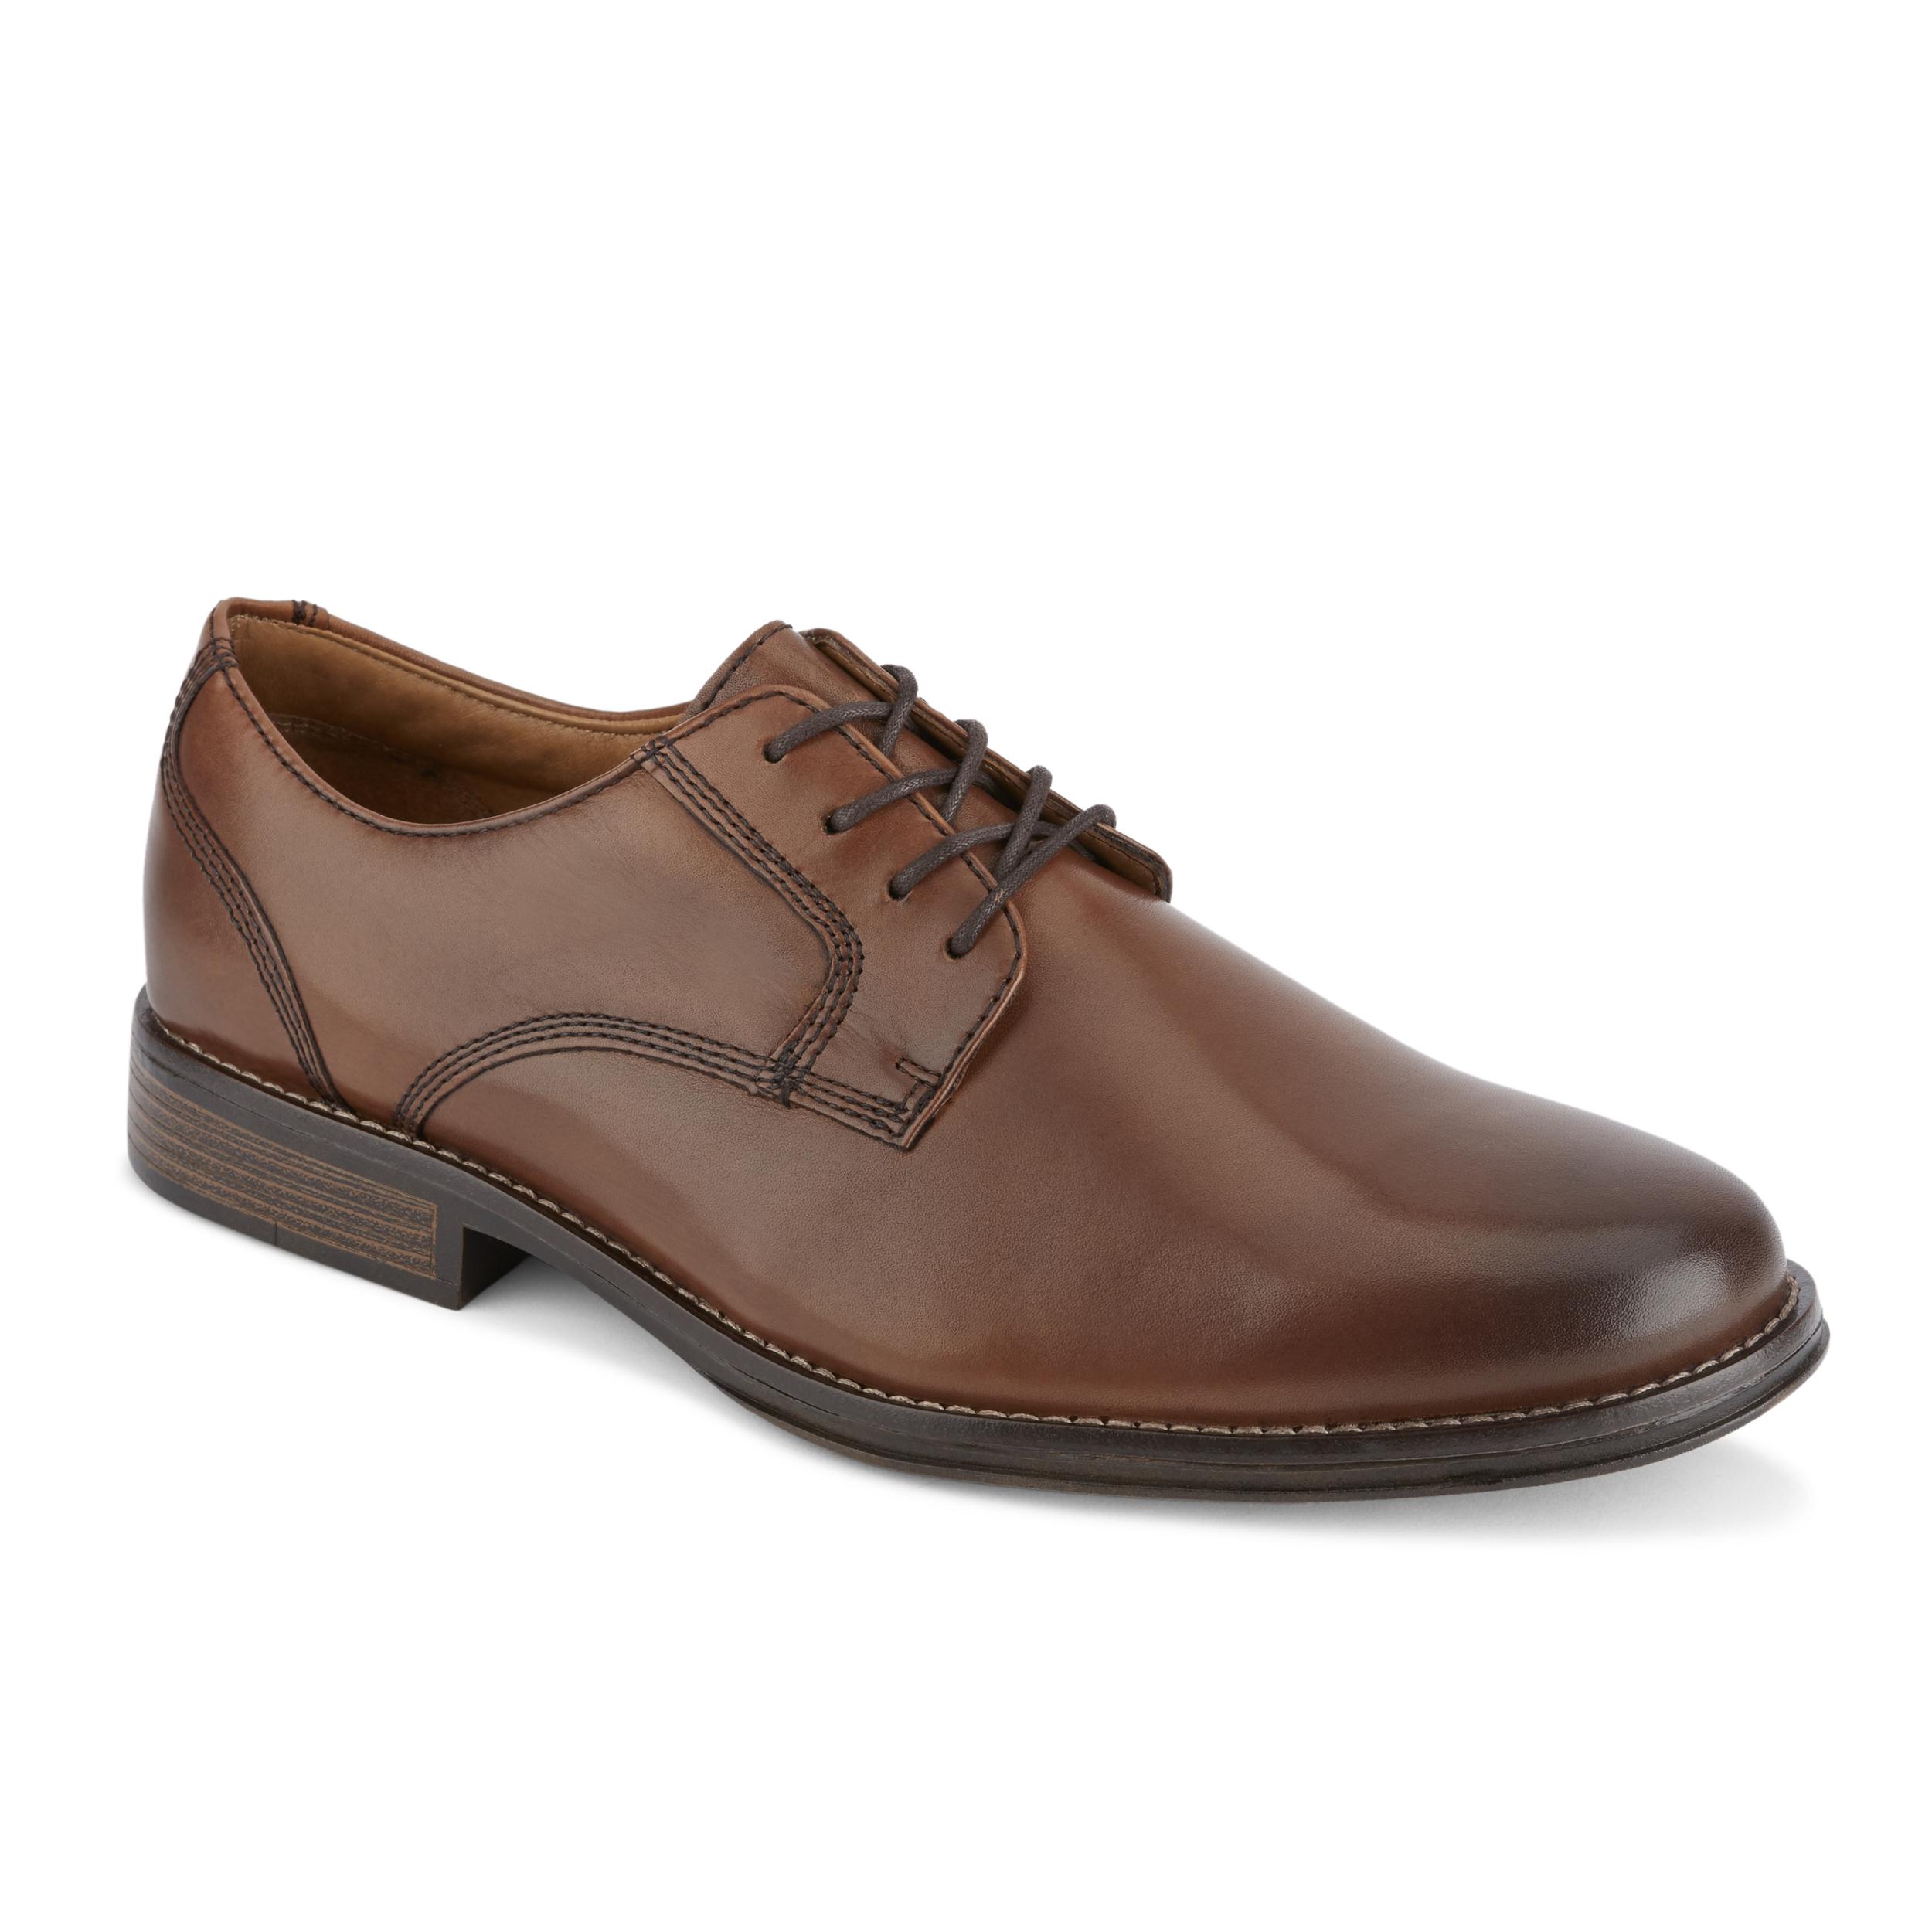 0cb0e3ef9ef Details about G.H. Bass   Co. Mens Hughes Leather Plain Toe Oxford Shoe  Size 8.5